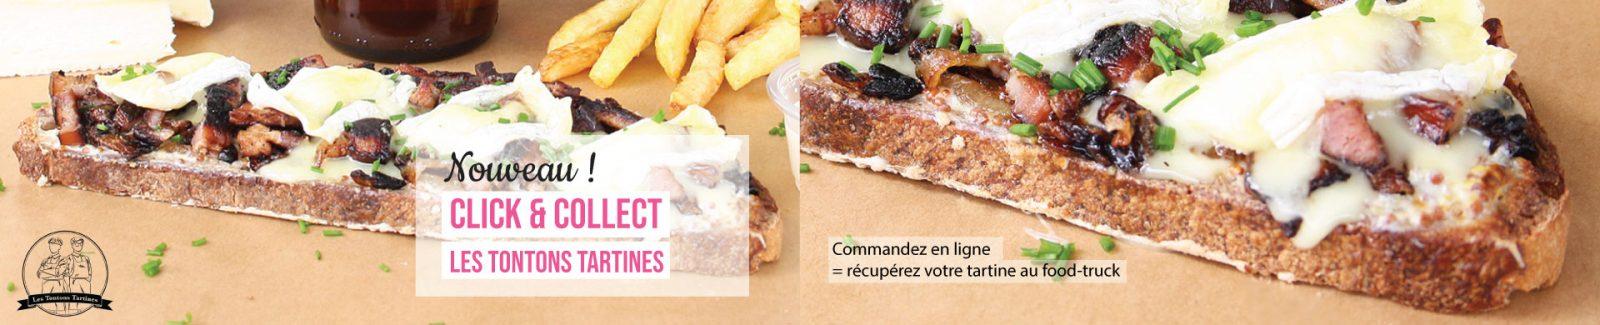 food-truck-tontons-tartines